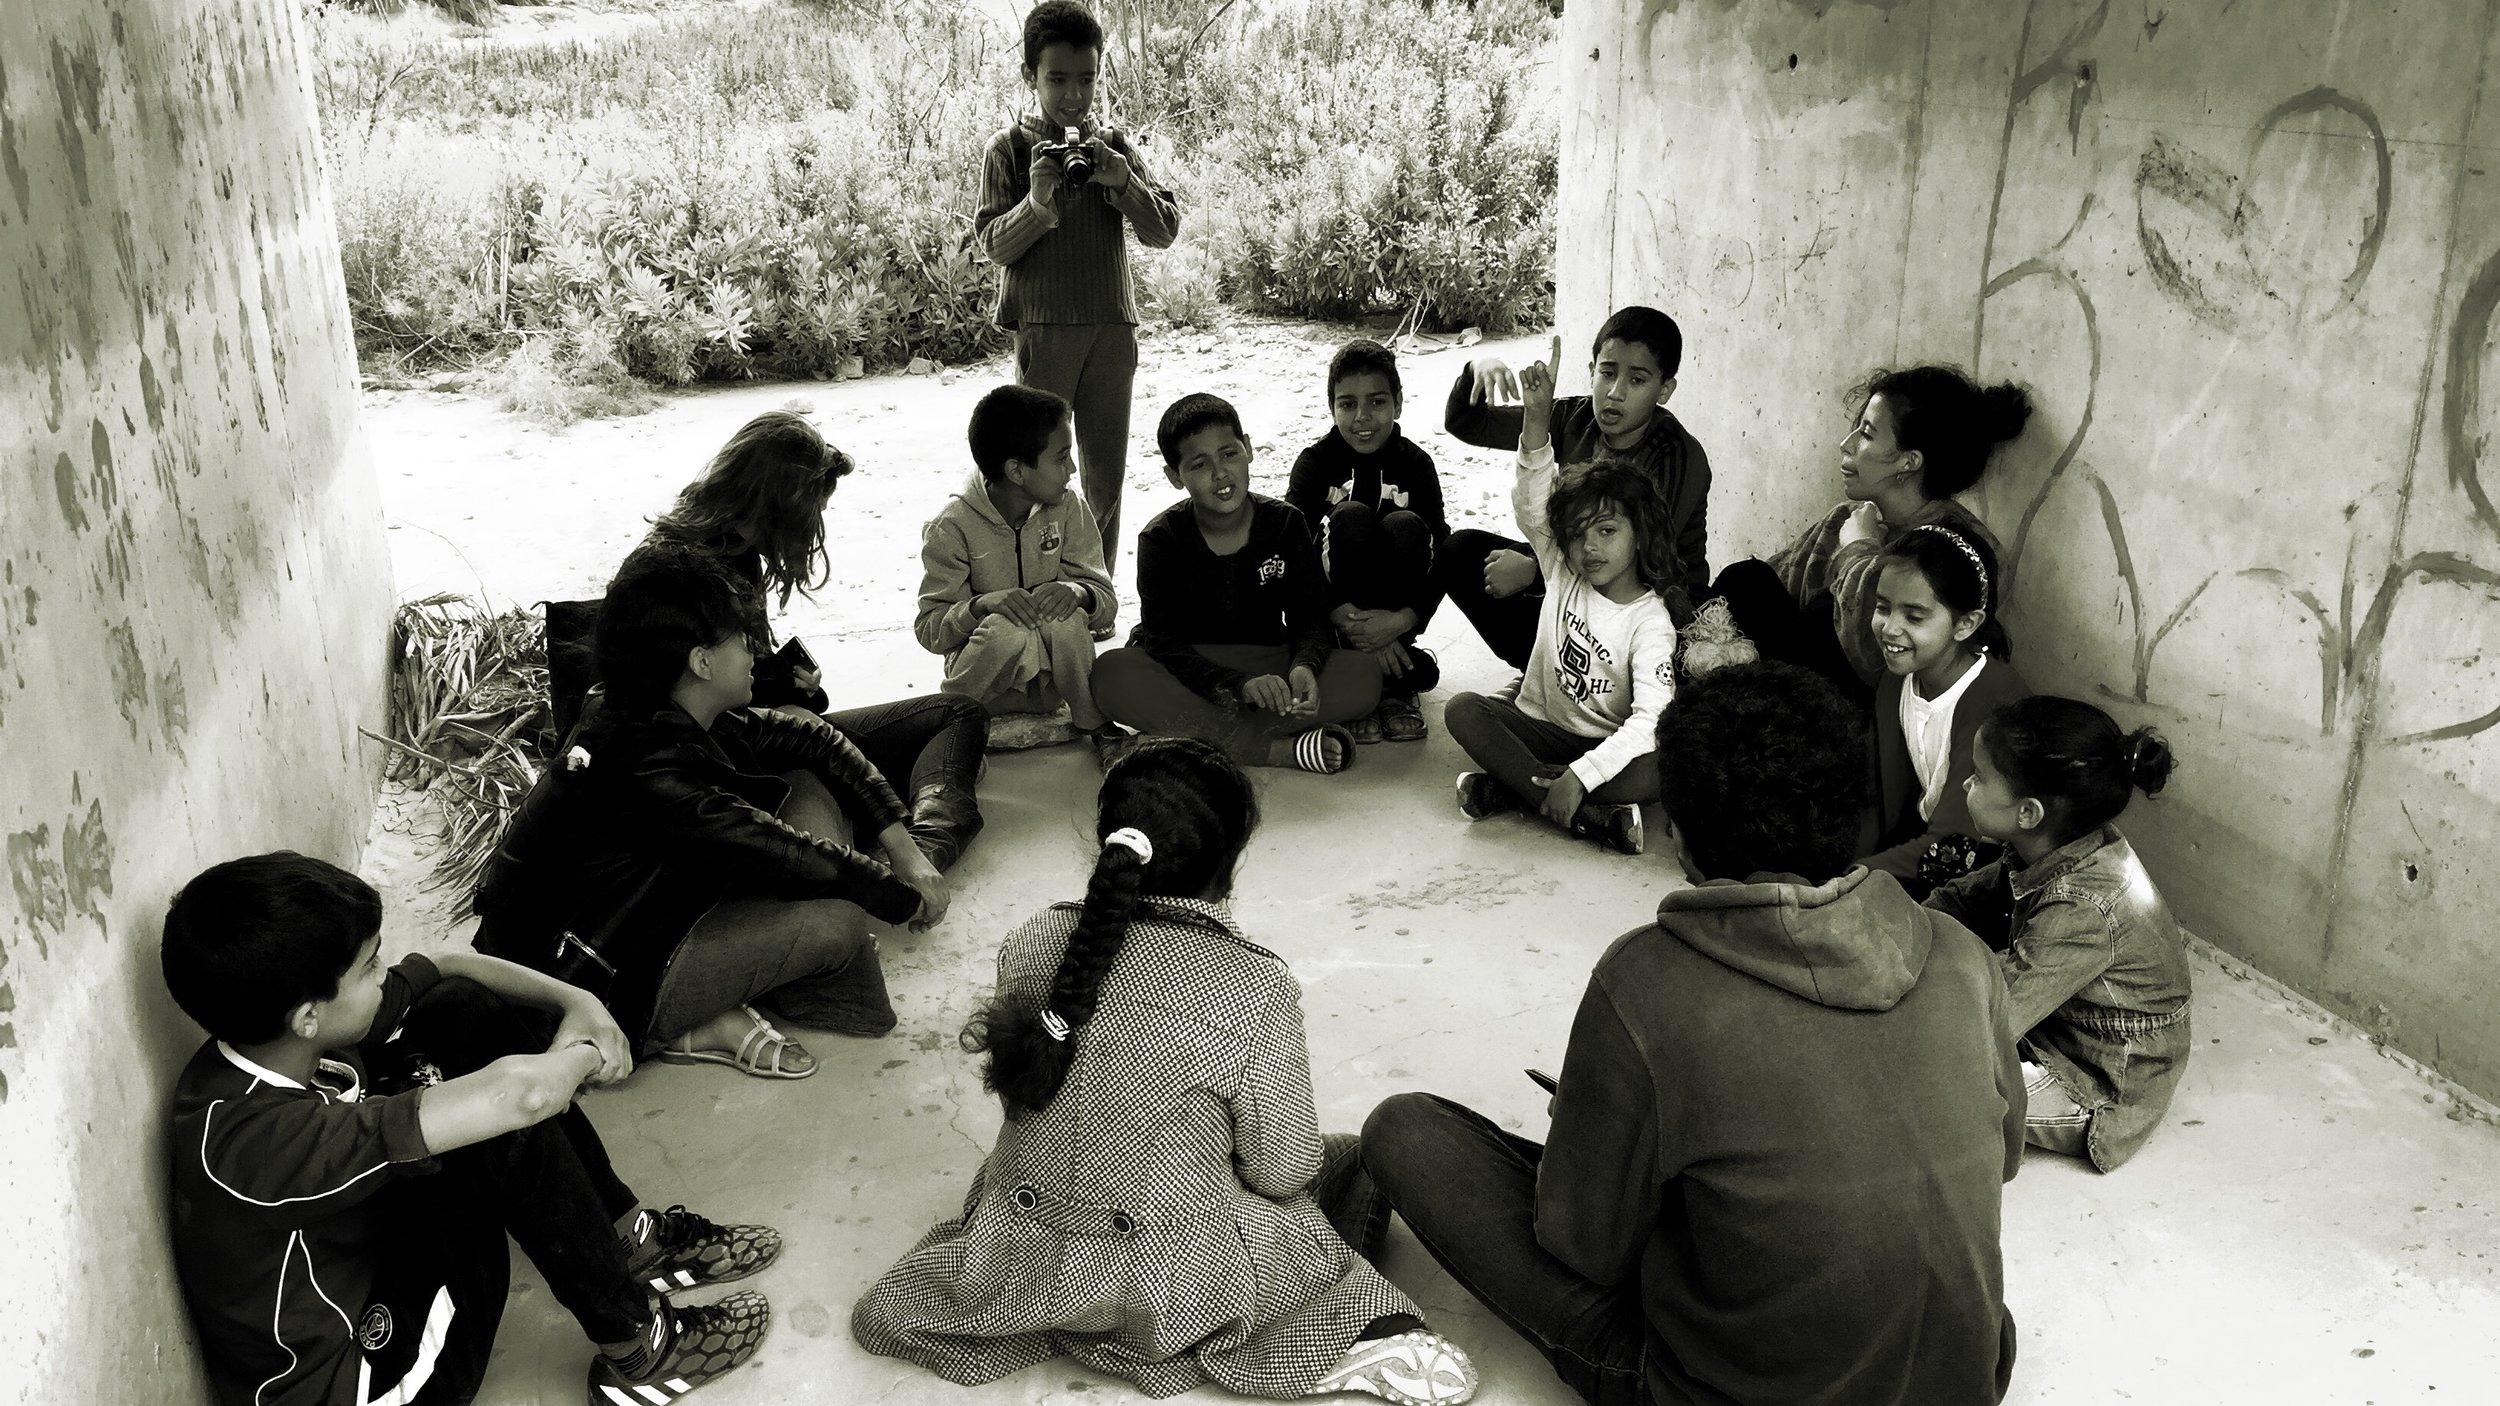 Omar during Nader-Masoero workshop in 2018